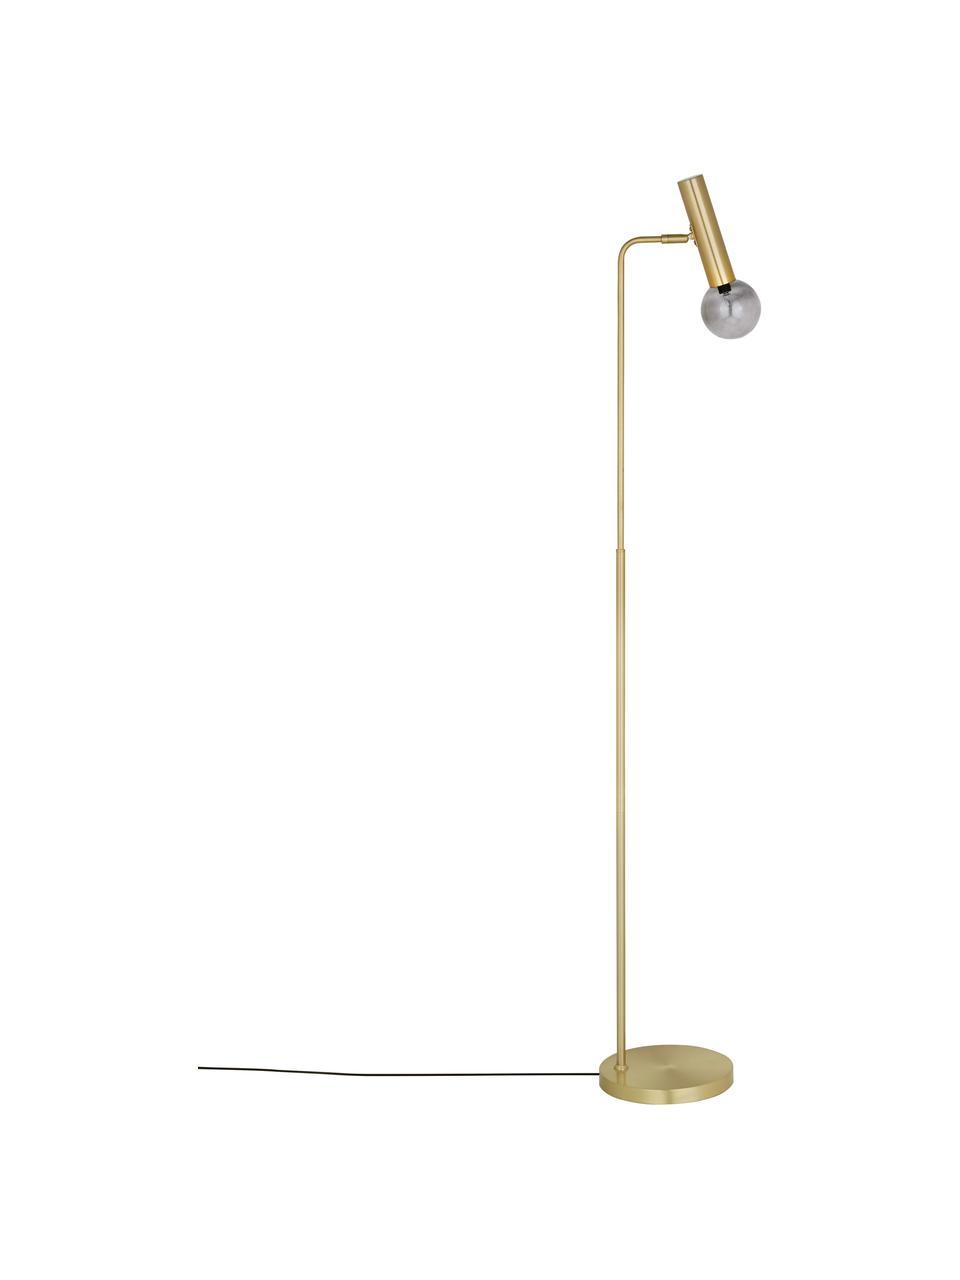 Leselampe Wilson mit Glasschirm, Lampenschirm: Glas, Metall, Lampenfuß: Metall, vermessingt, Messing, 28 x 151 cm